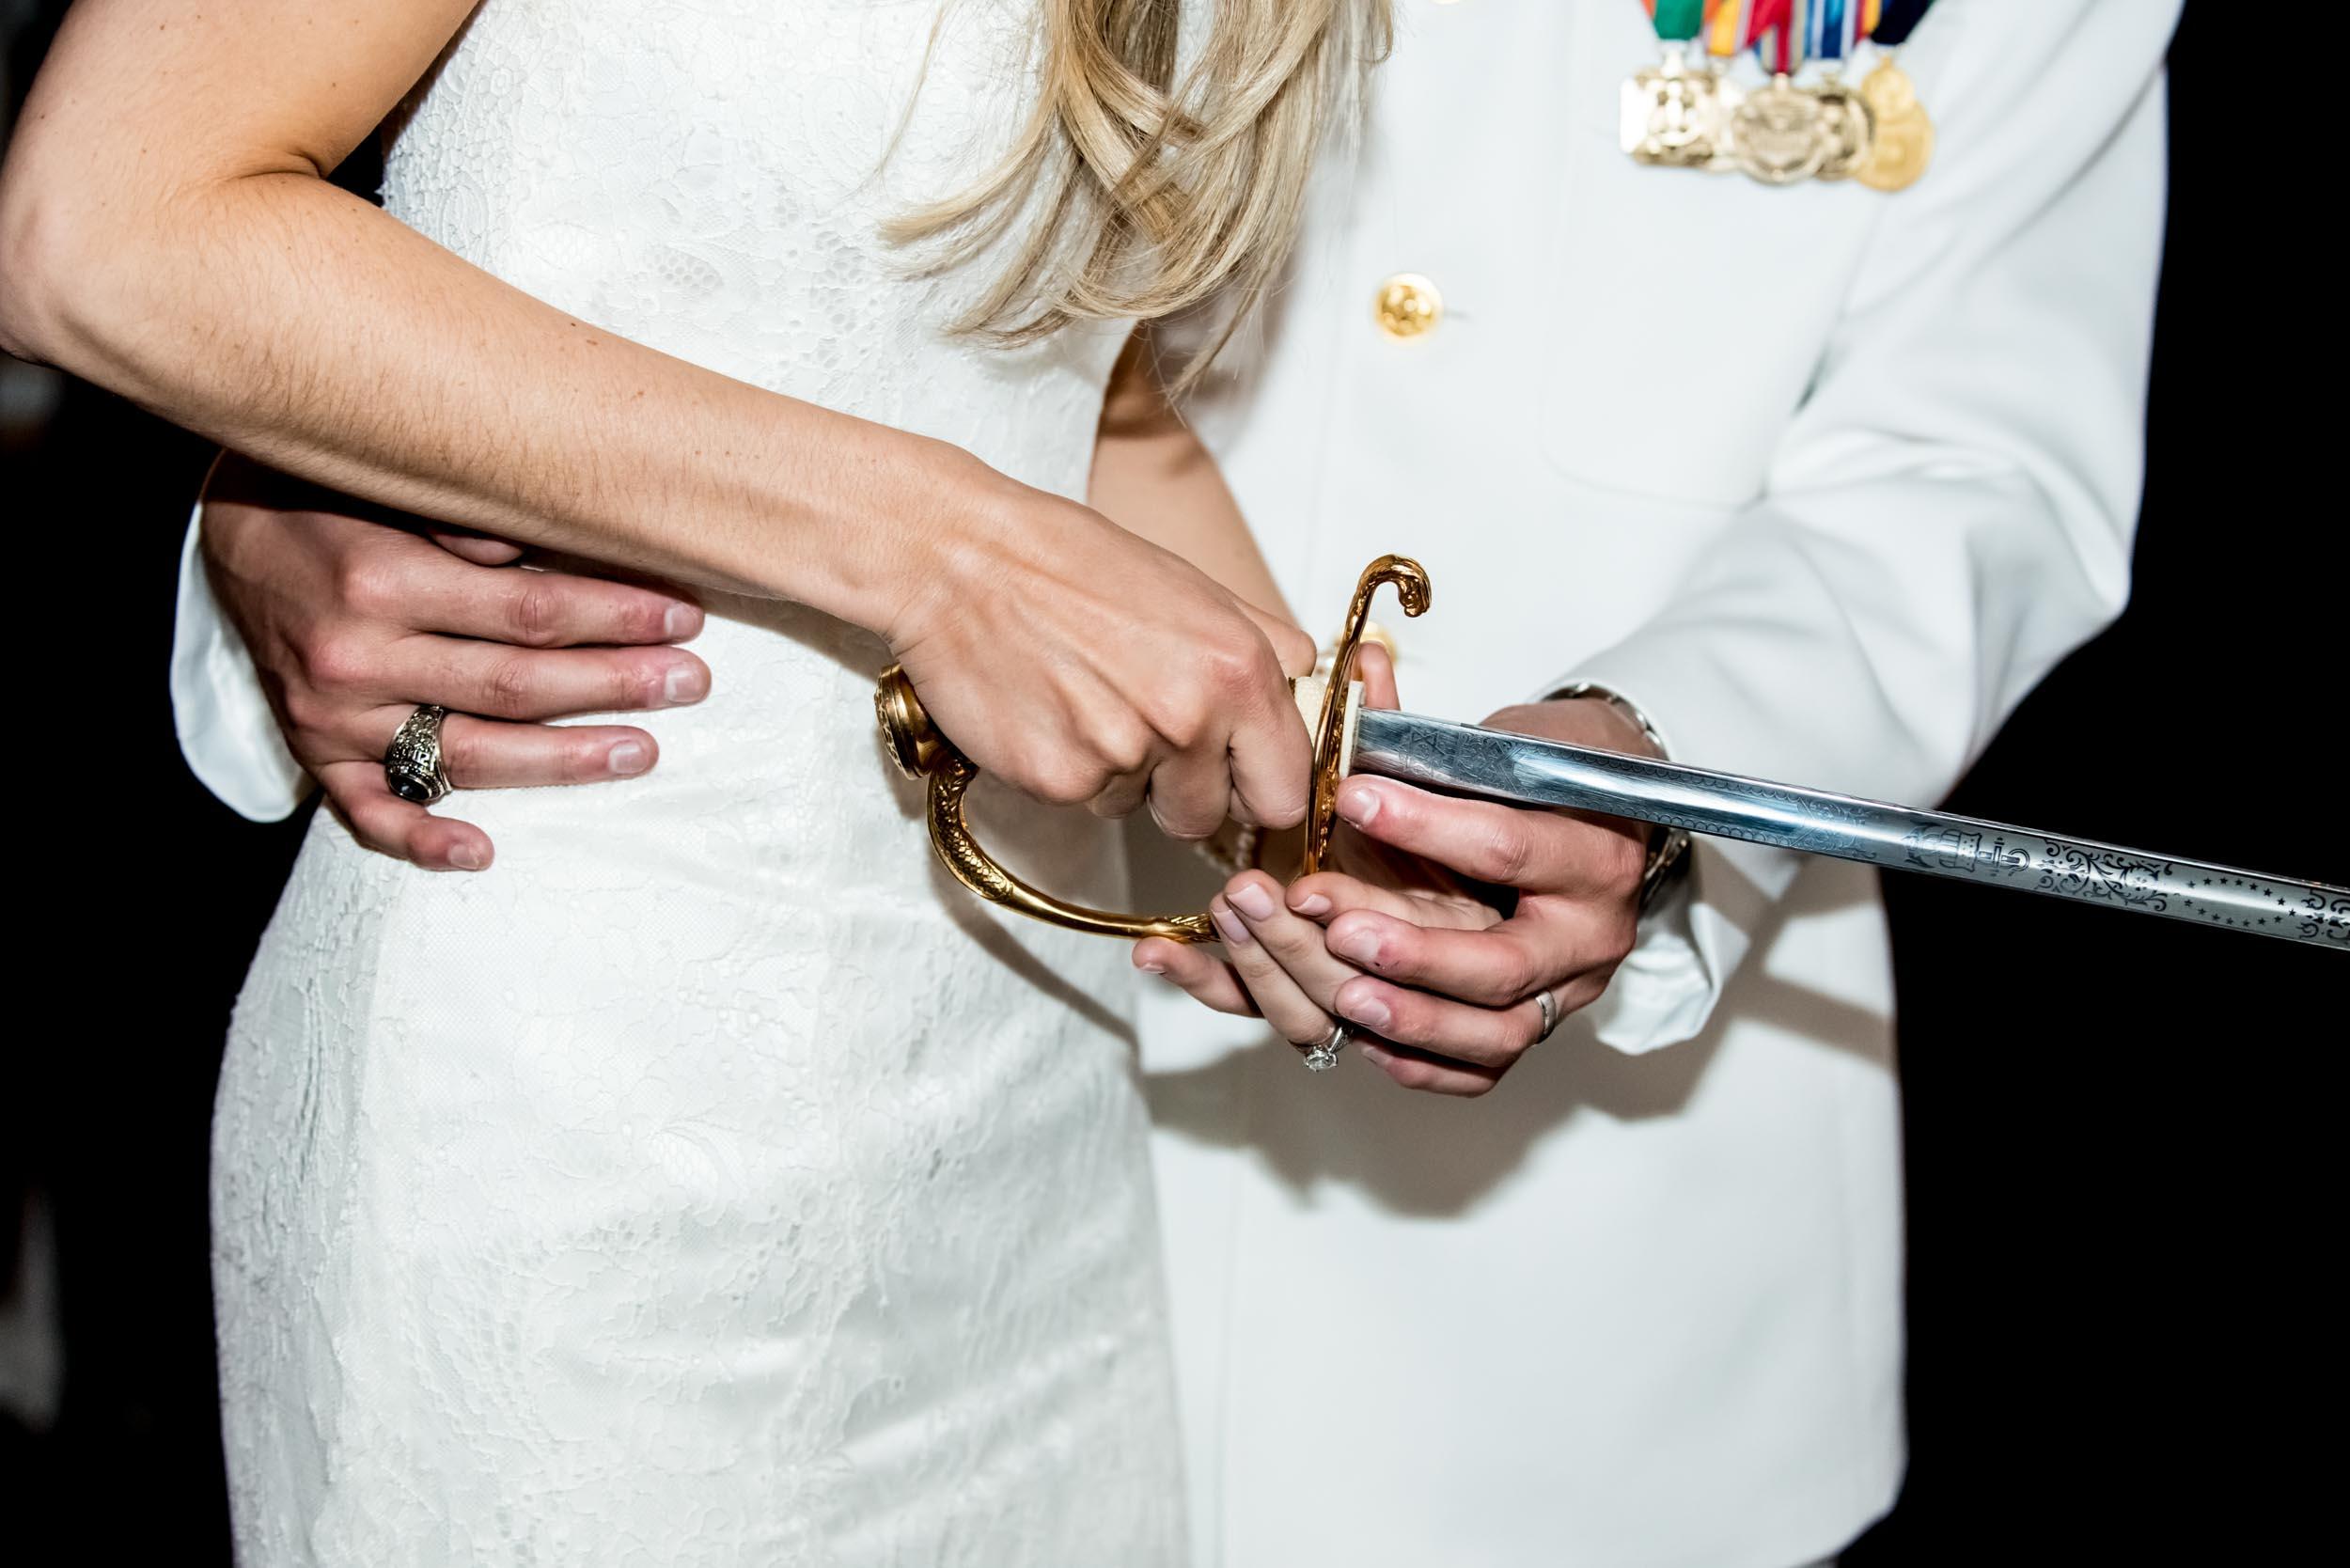 dc+metro+wedding+photographer+vadym+guliuk+photography+wedding+cake-cutting-2020.jpg